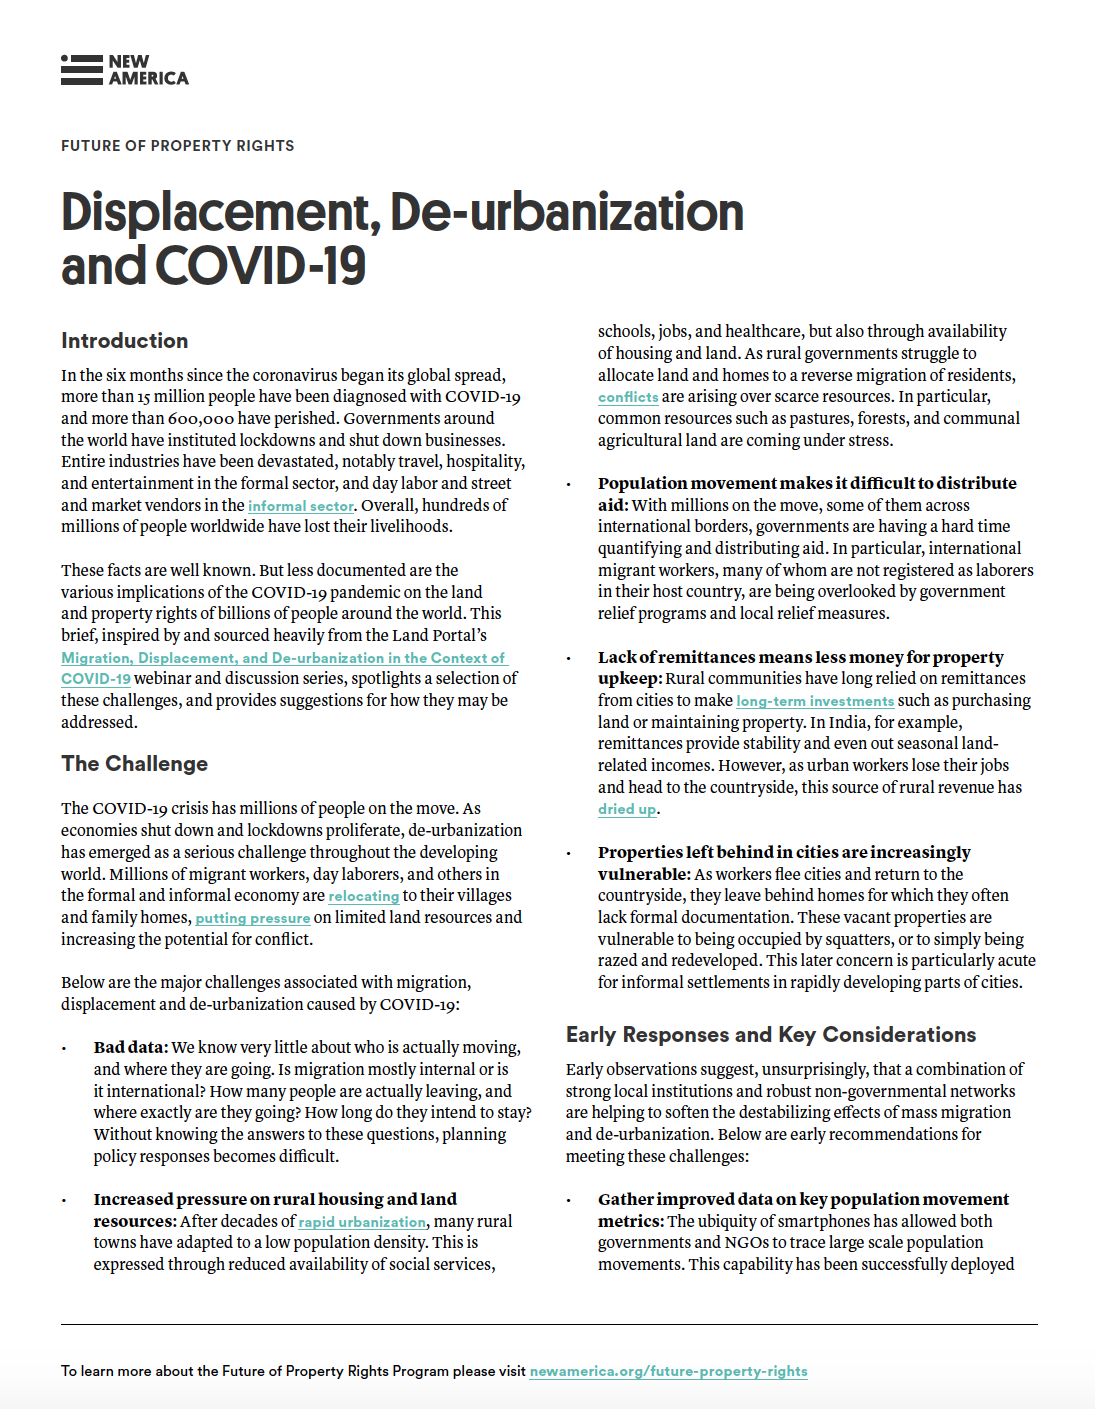 Displacement, De-urbanization, and COVID-19